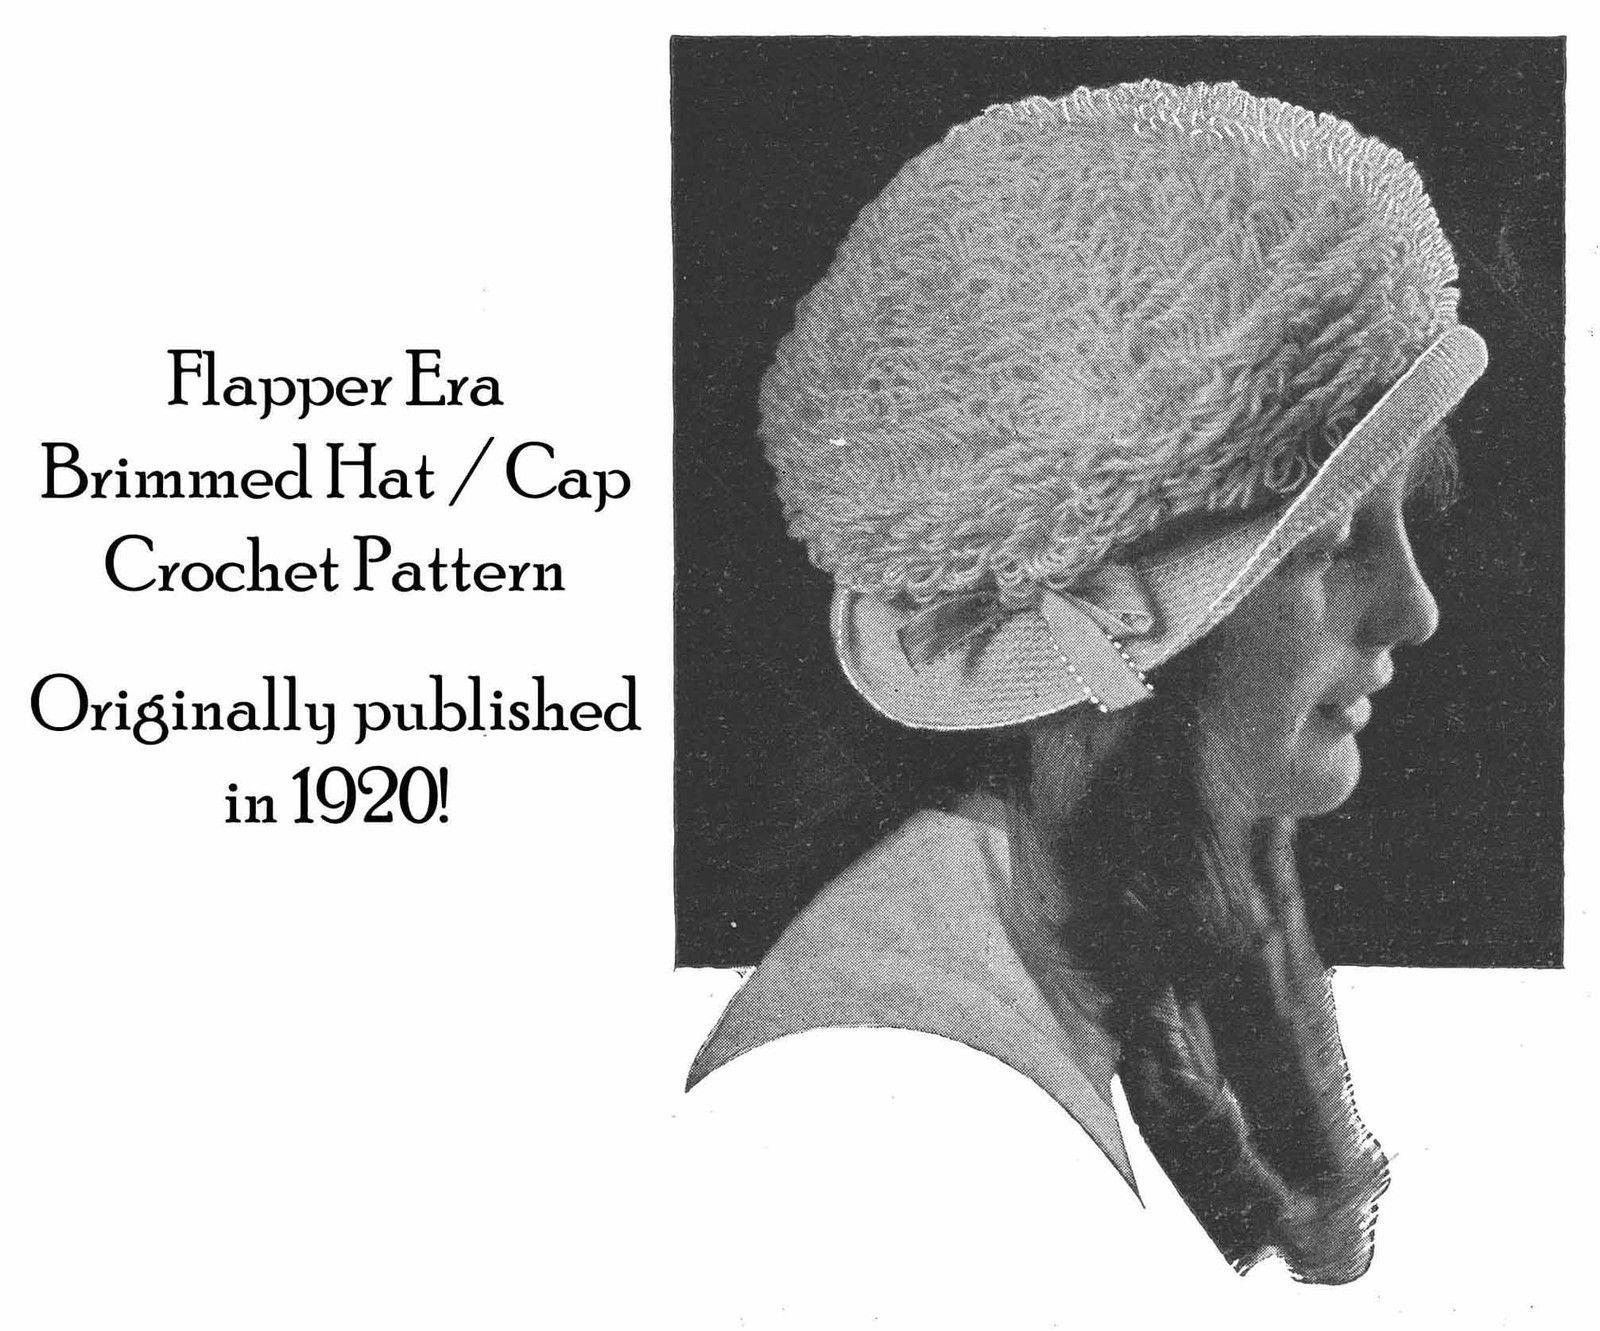 1920 Flapper Era Brimmed Hat Crochet Pattern Titanic Era Fashion Reenactment 1